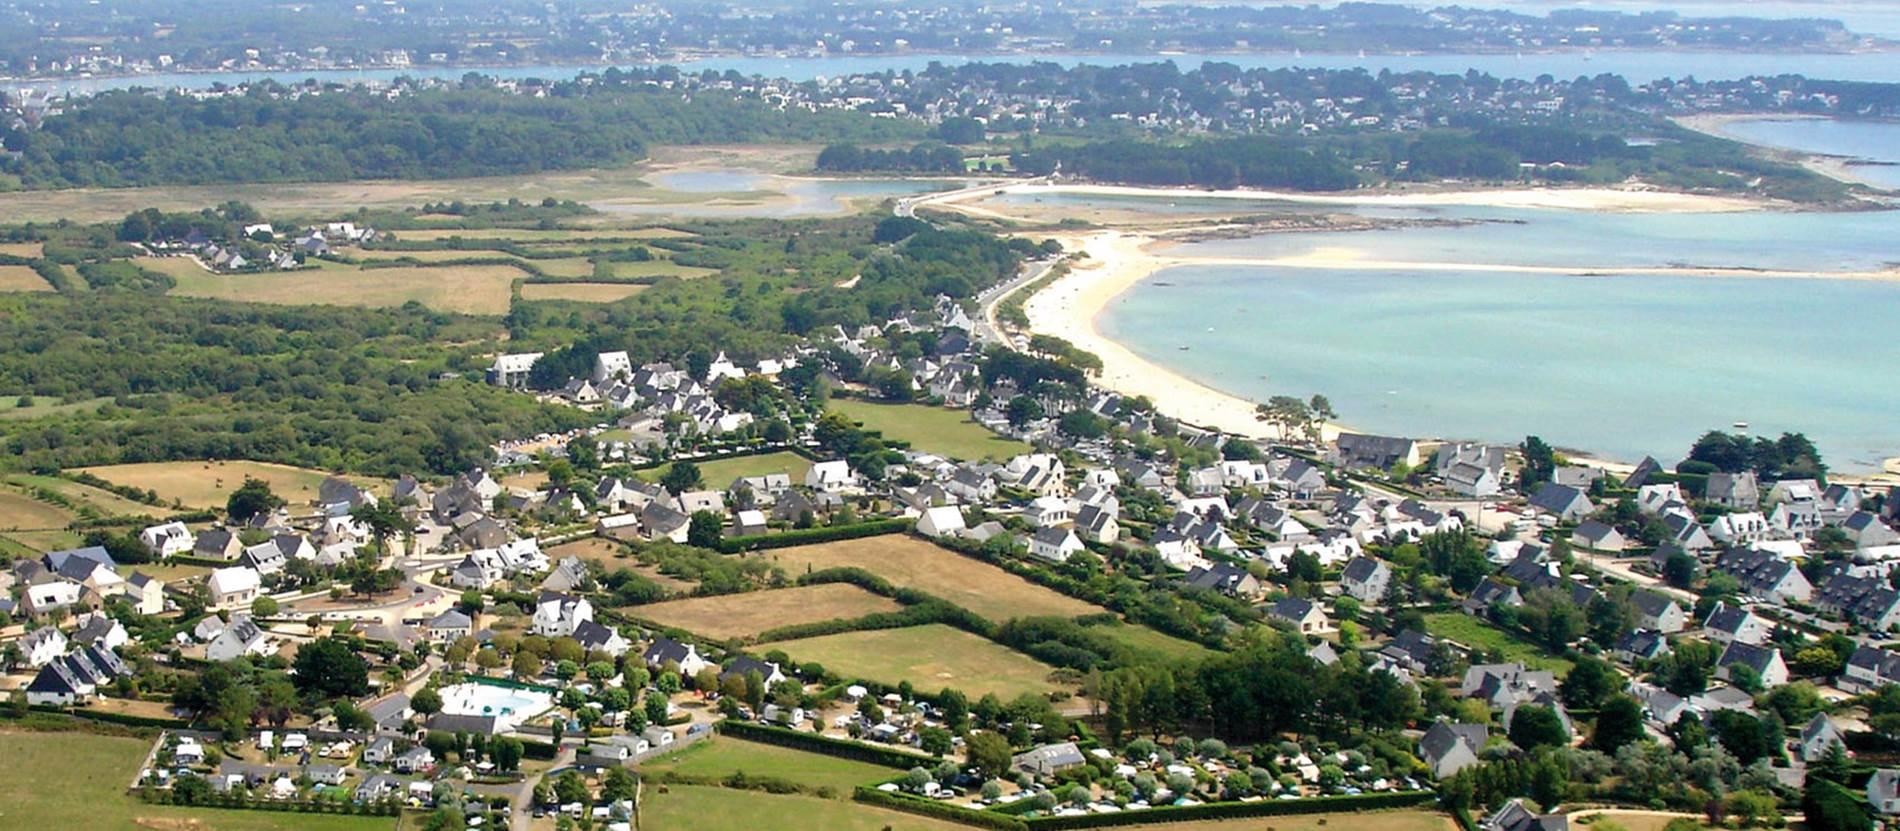 Camping-Les-Druides-Carnac-Morbihan-Bretagne-Sud © Camping-Les-Druides-Carnac-